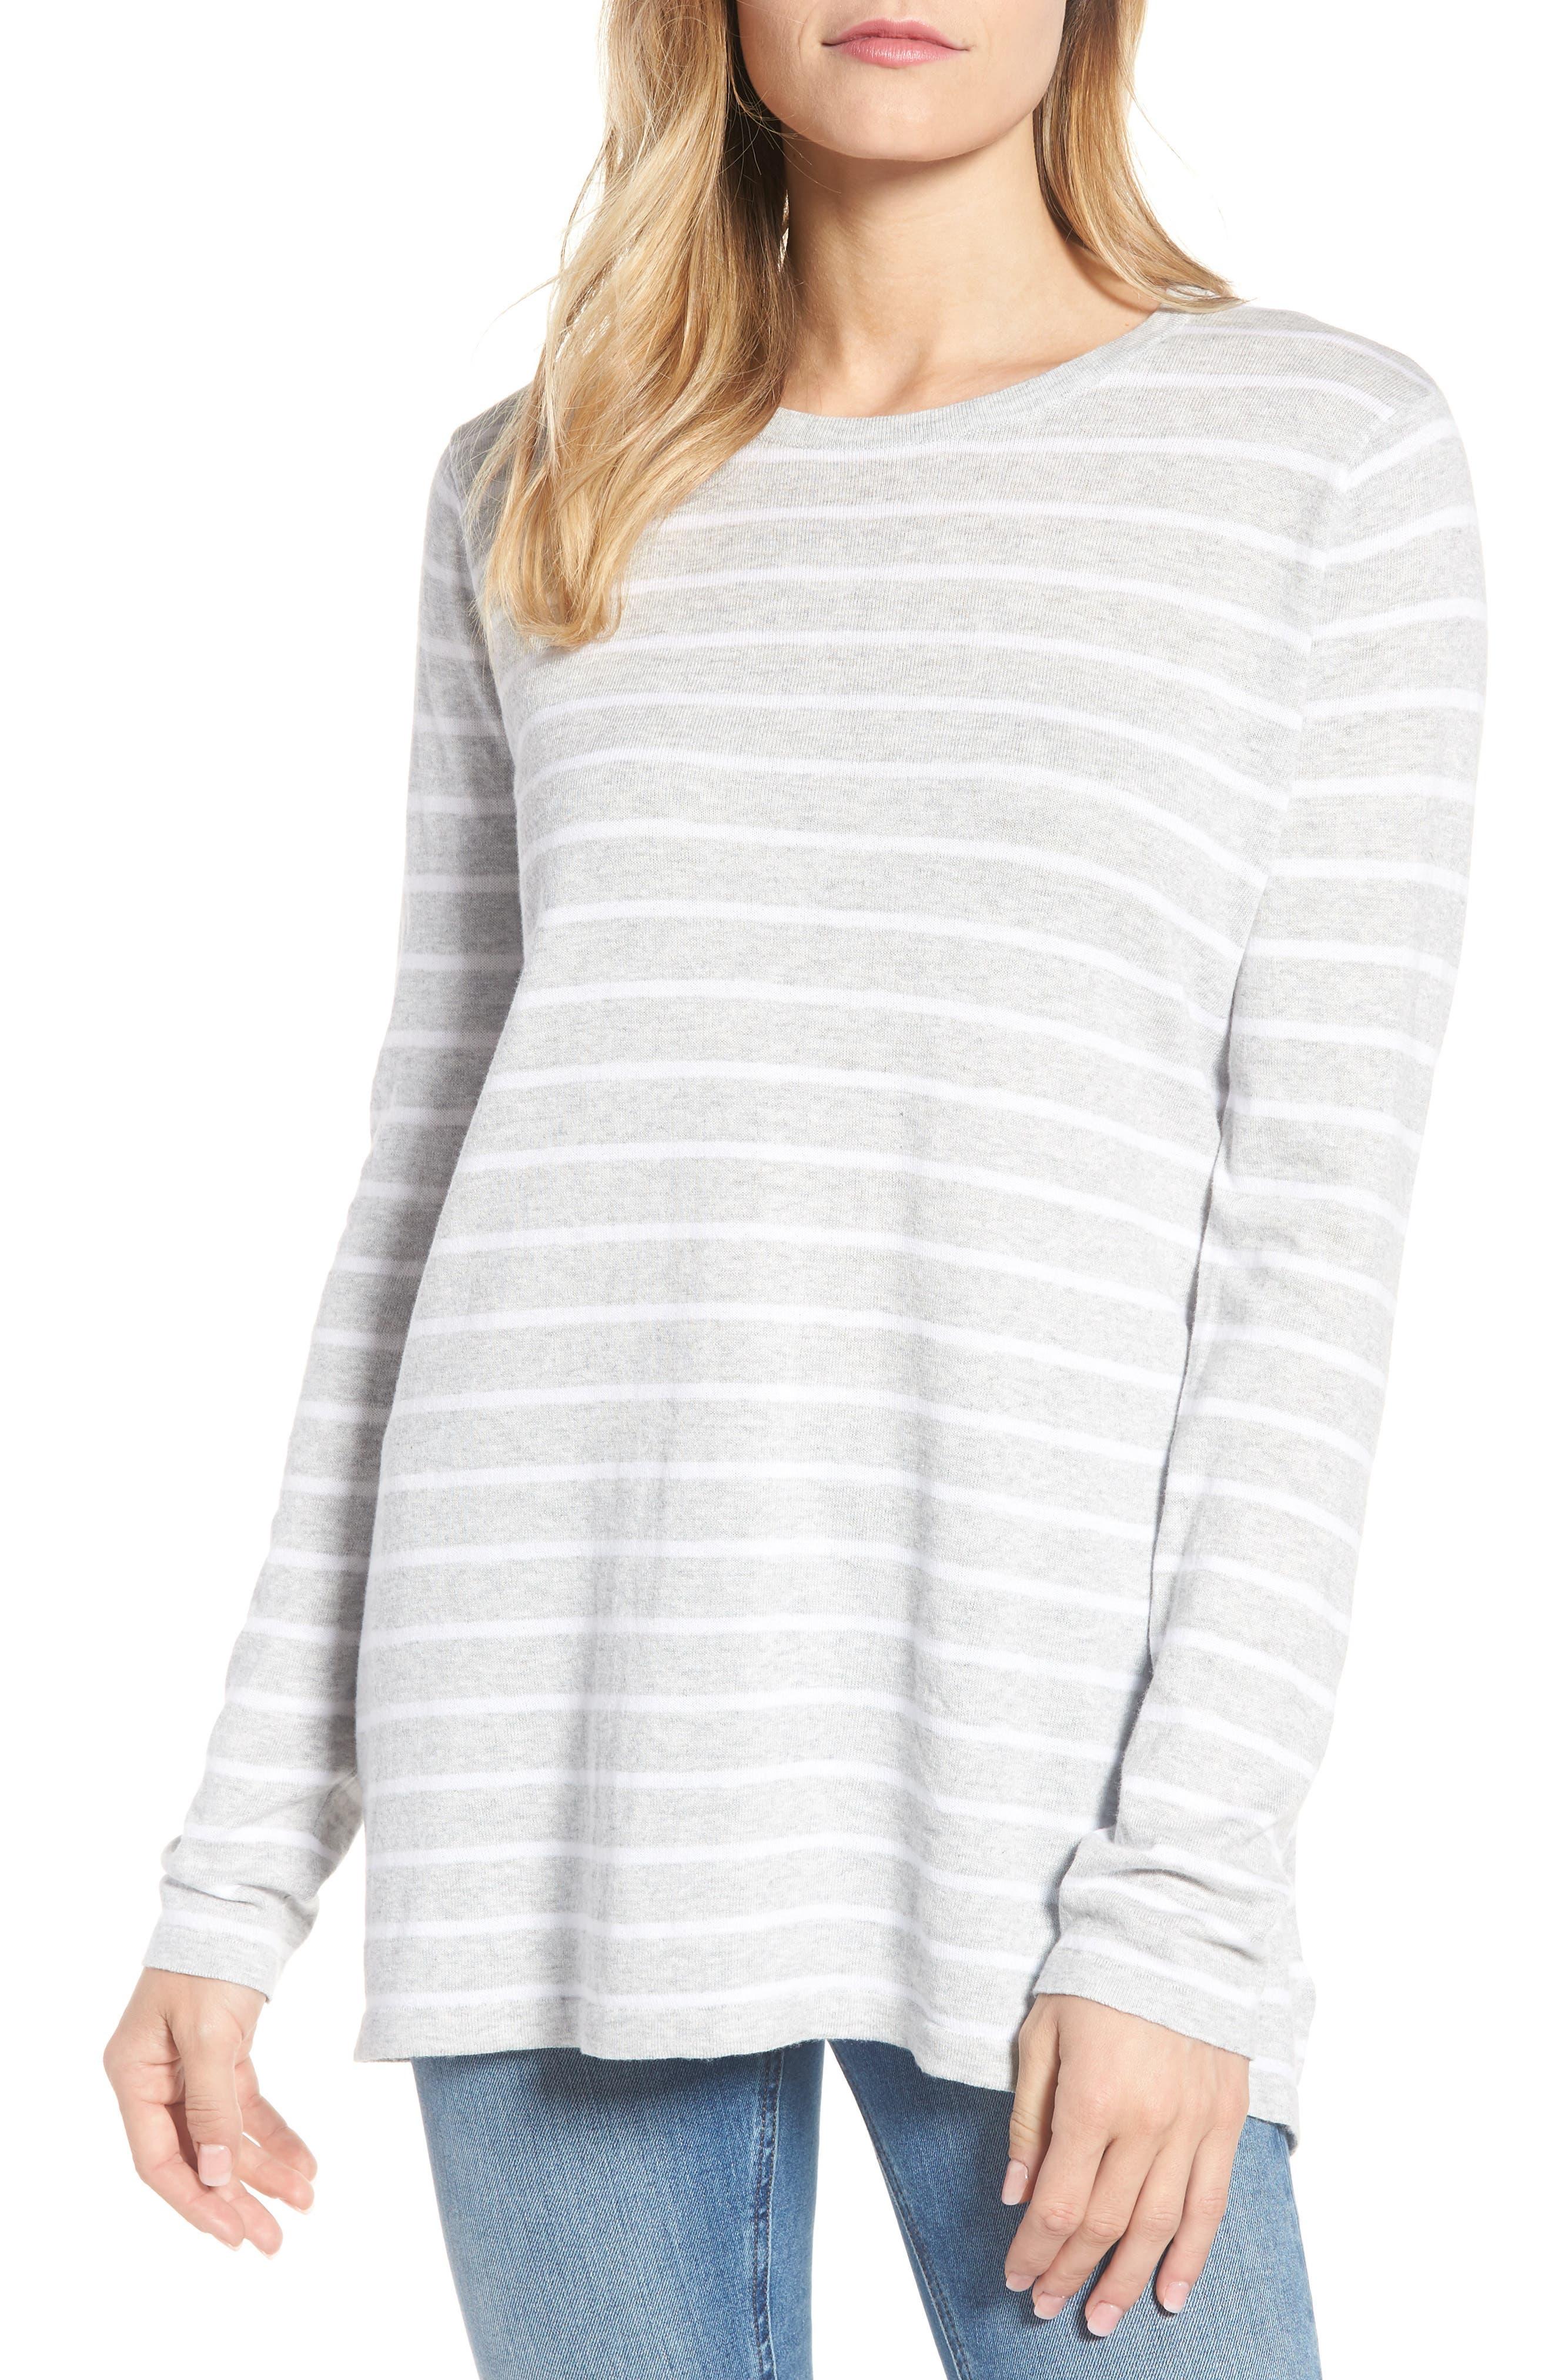 Cotton Blend Stripe Trapeze Cotton Blend Sweater,                         Main,                         color, Pebble Grey Mix Warm White